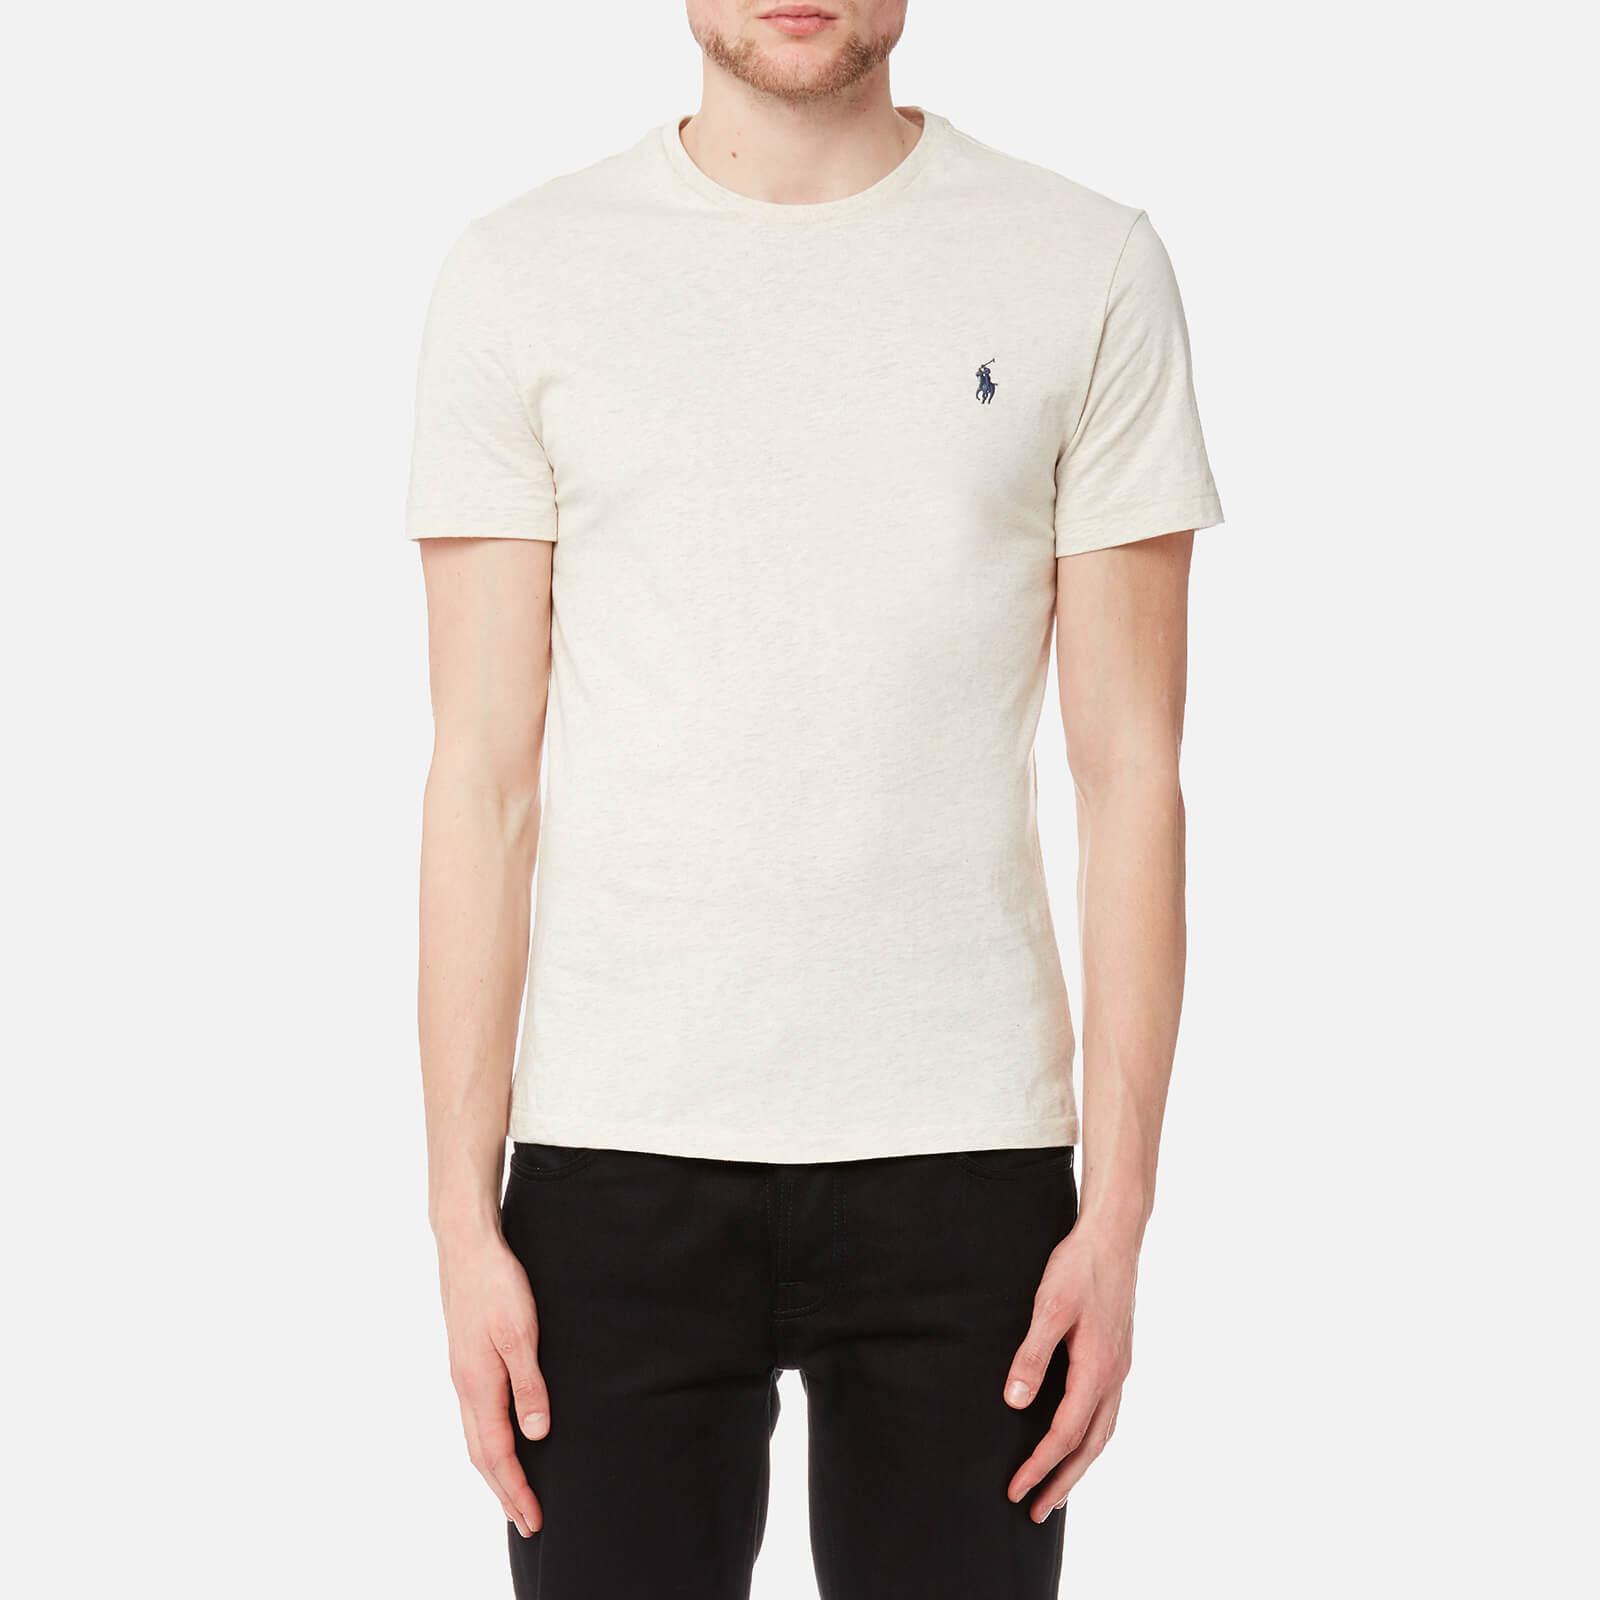 cbcca586 Polo Ralph Lauren Men's Short Sleeve Crew Neck T-Shirt - New Sand Heather -  Free UK Delivery over £50